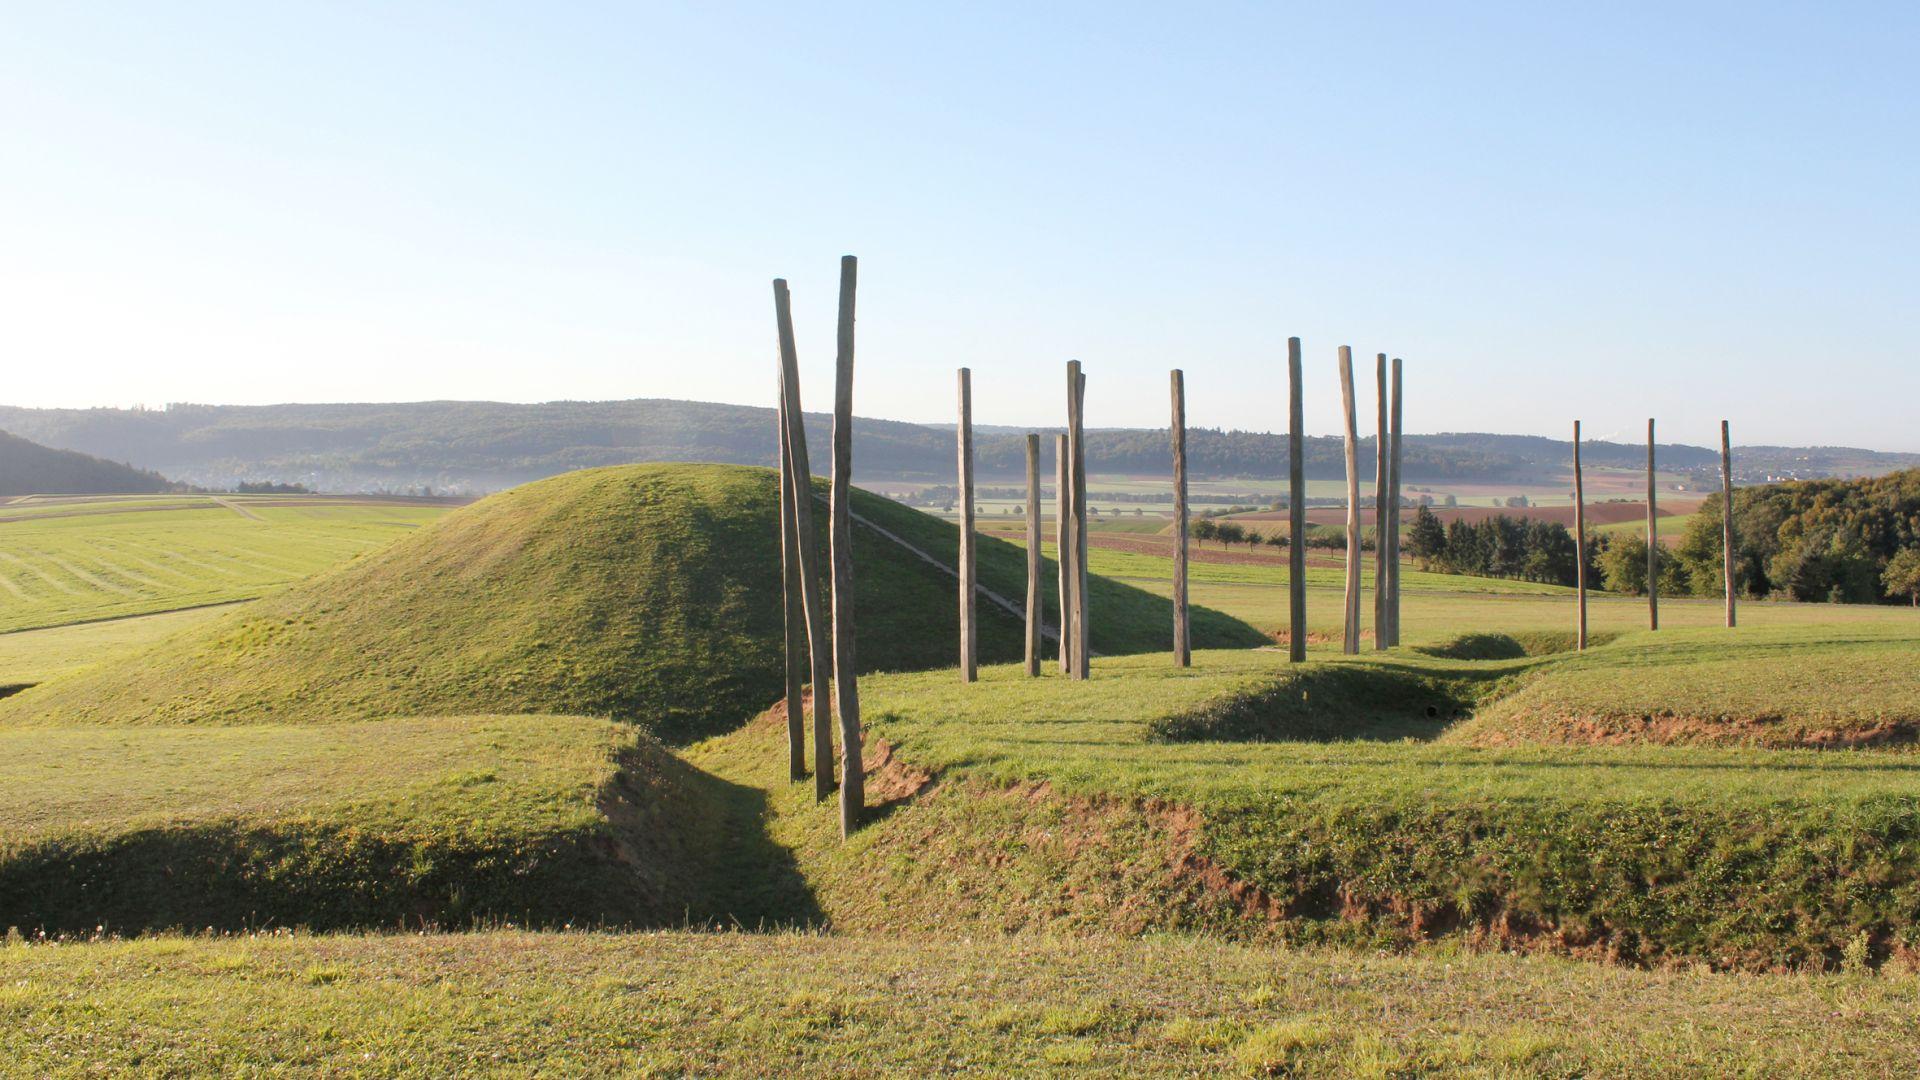 Glauburg: Grave mound in the Archaeological Park Keltenwelt am Glauberg